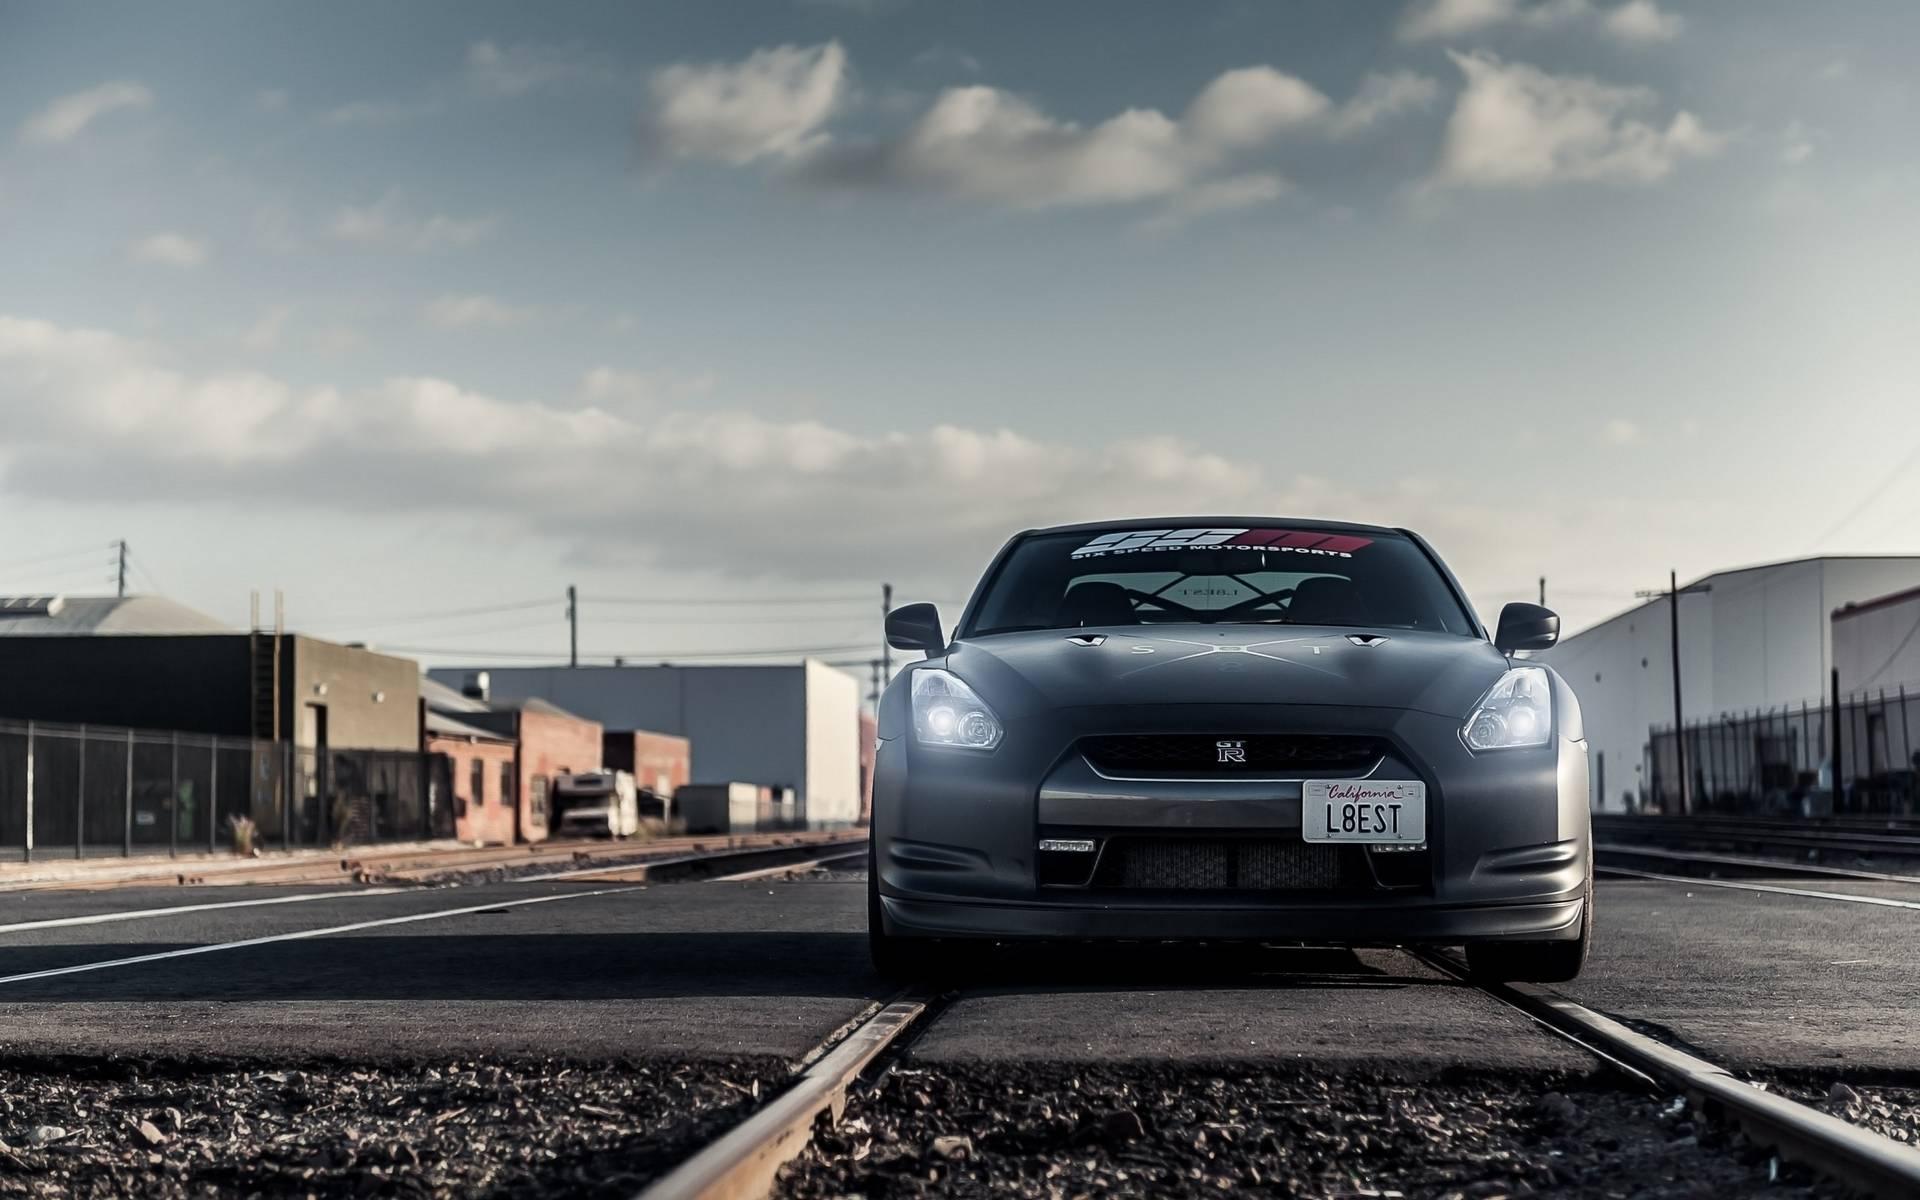 Nissan GTR, ниссан гтр, фары